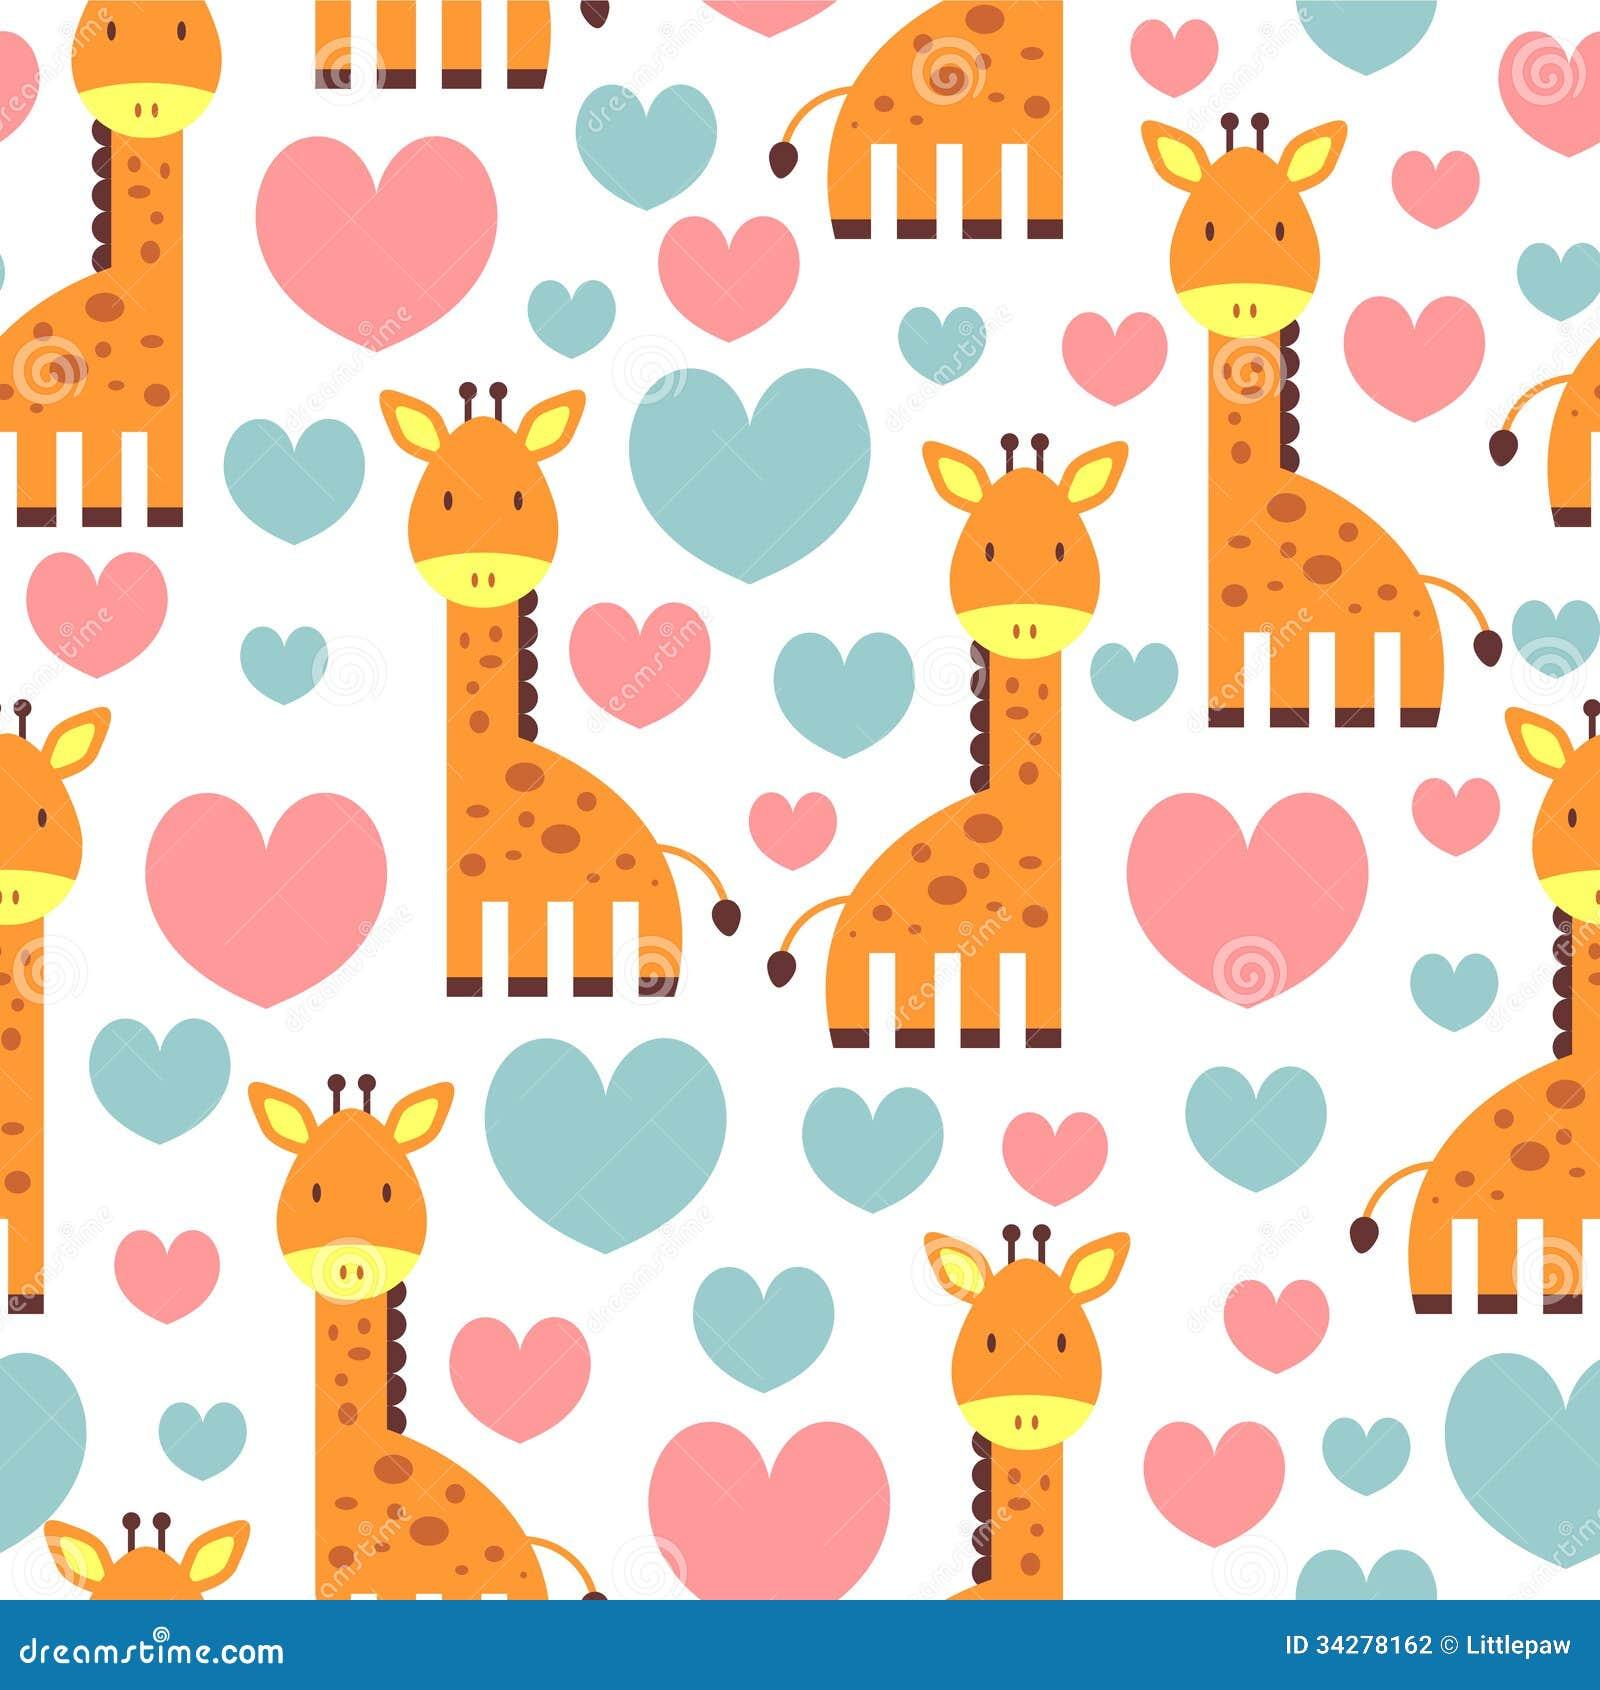 Сute Seamless Pattern With Giraffe Stock Photography